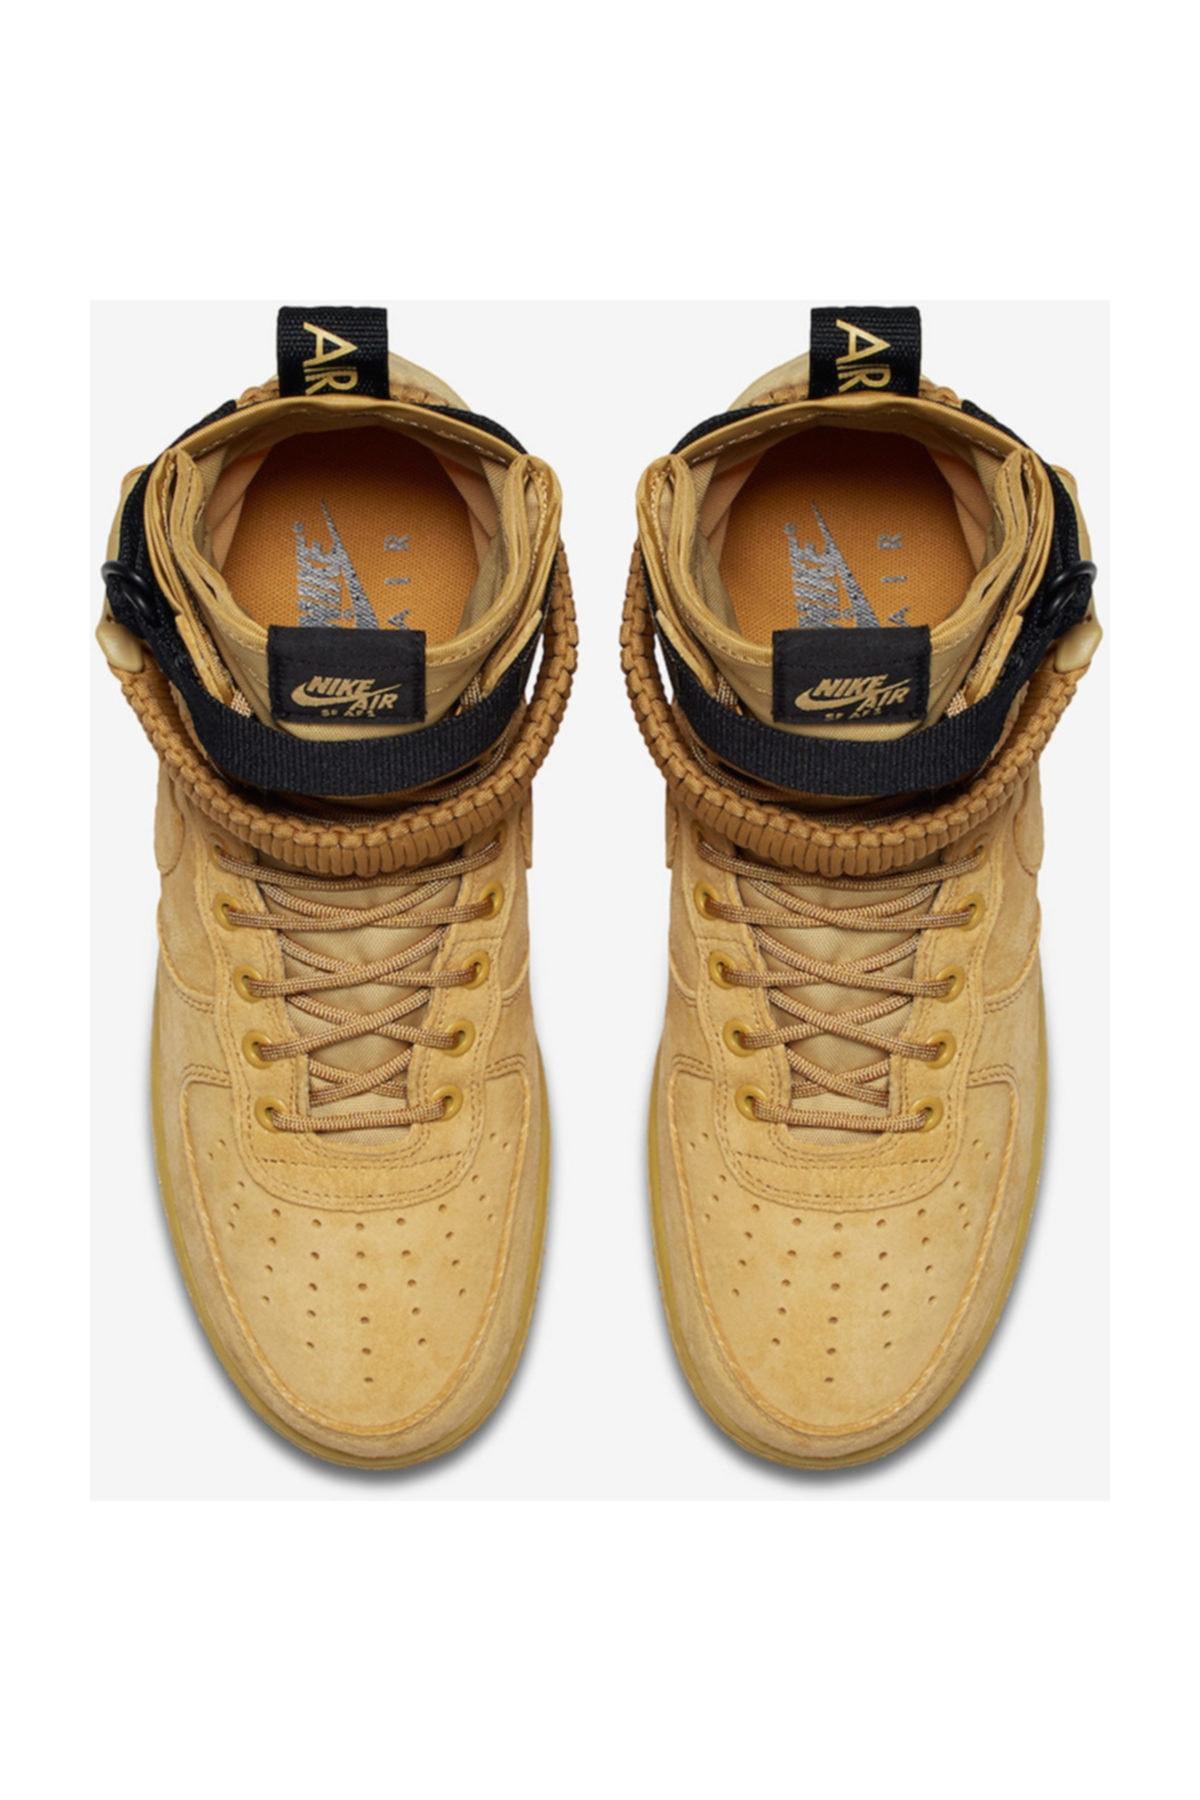 Nike Sf-af1 Wheat Erkek Bot | Trendyol